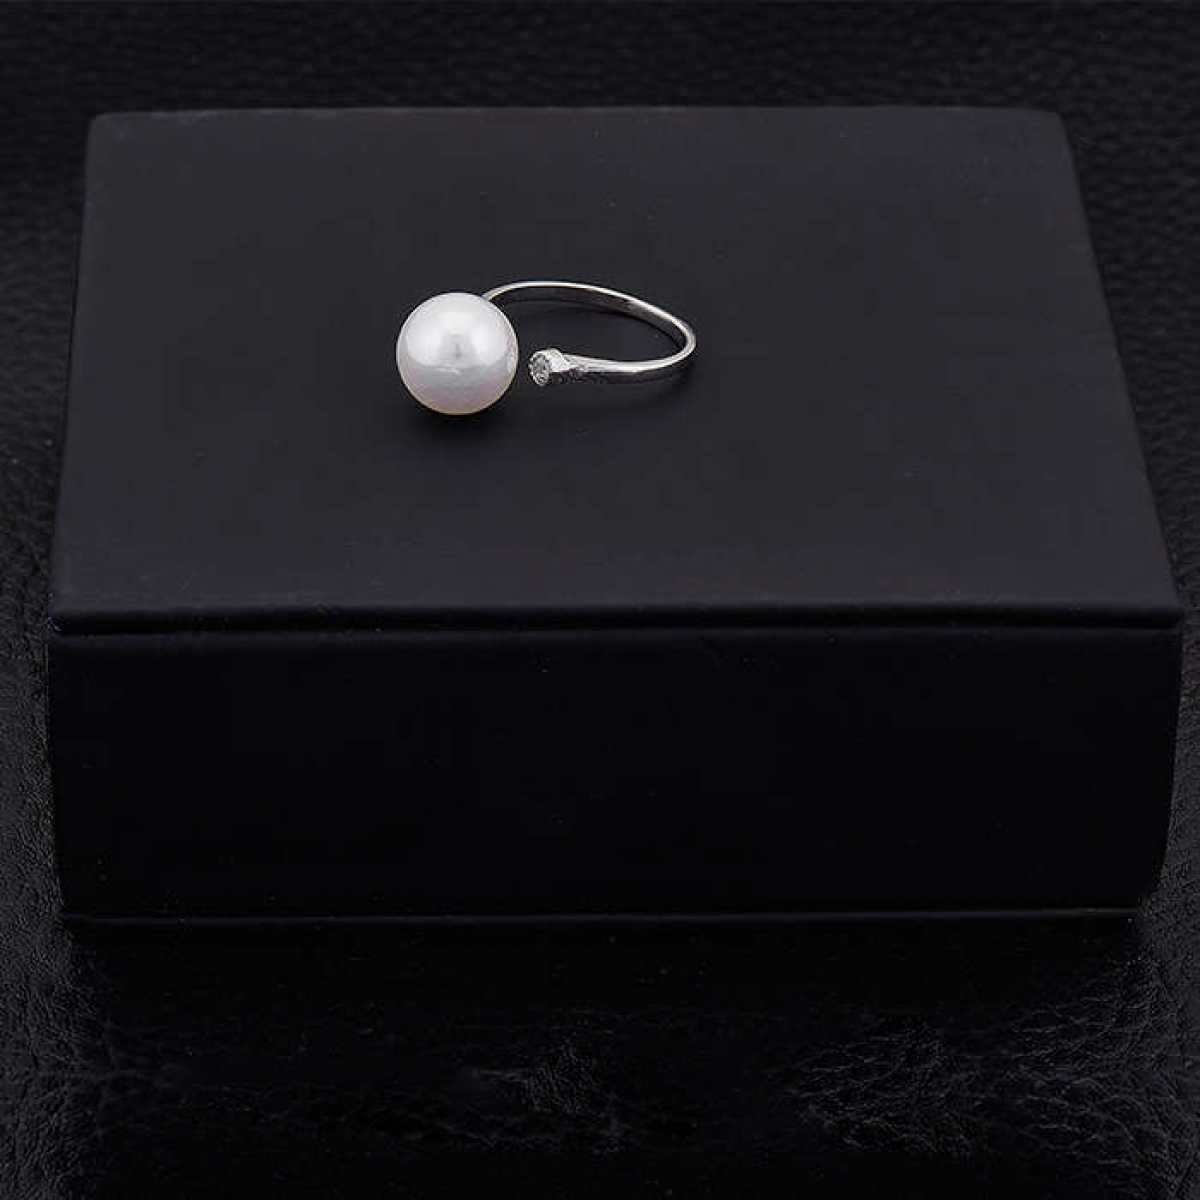 Unique Pearl With Diamond Silver Ring